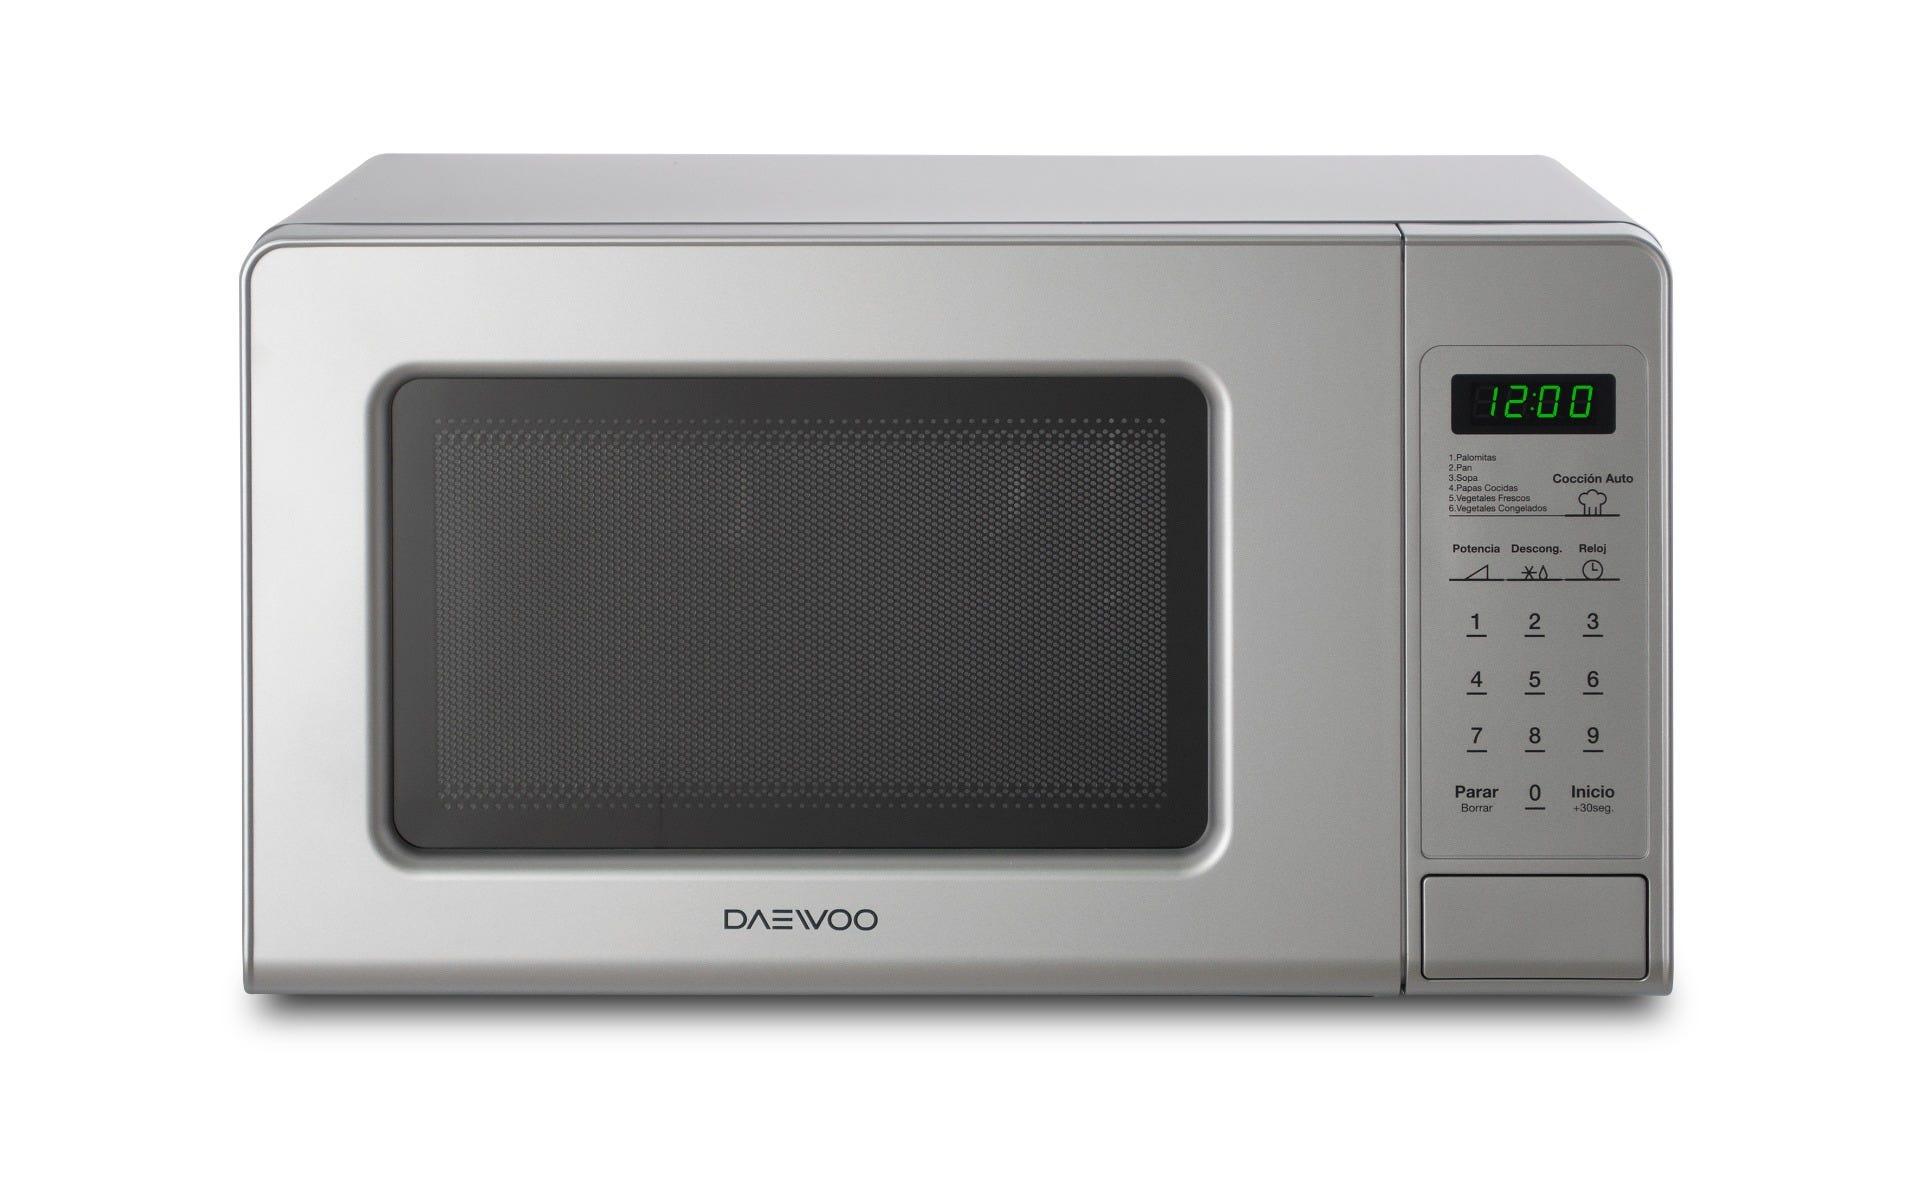 Microondas Daewoo® KOR-661S en plateado